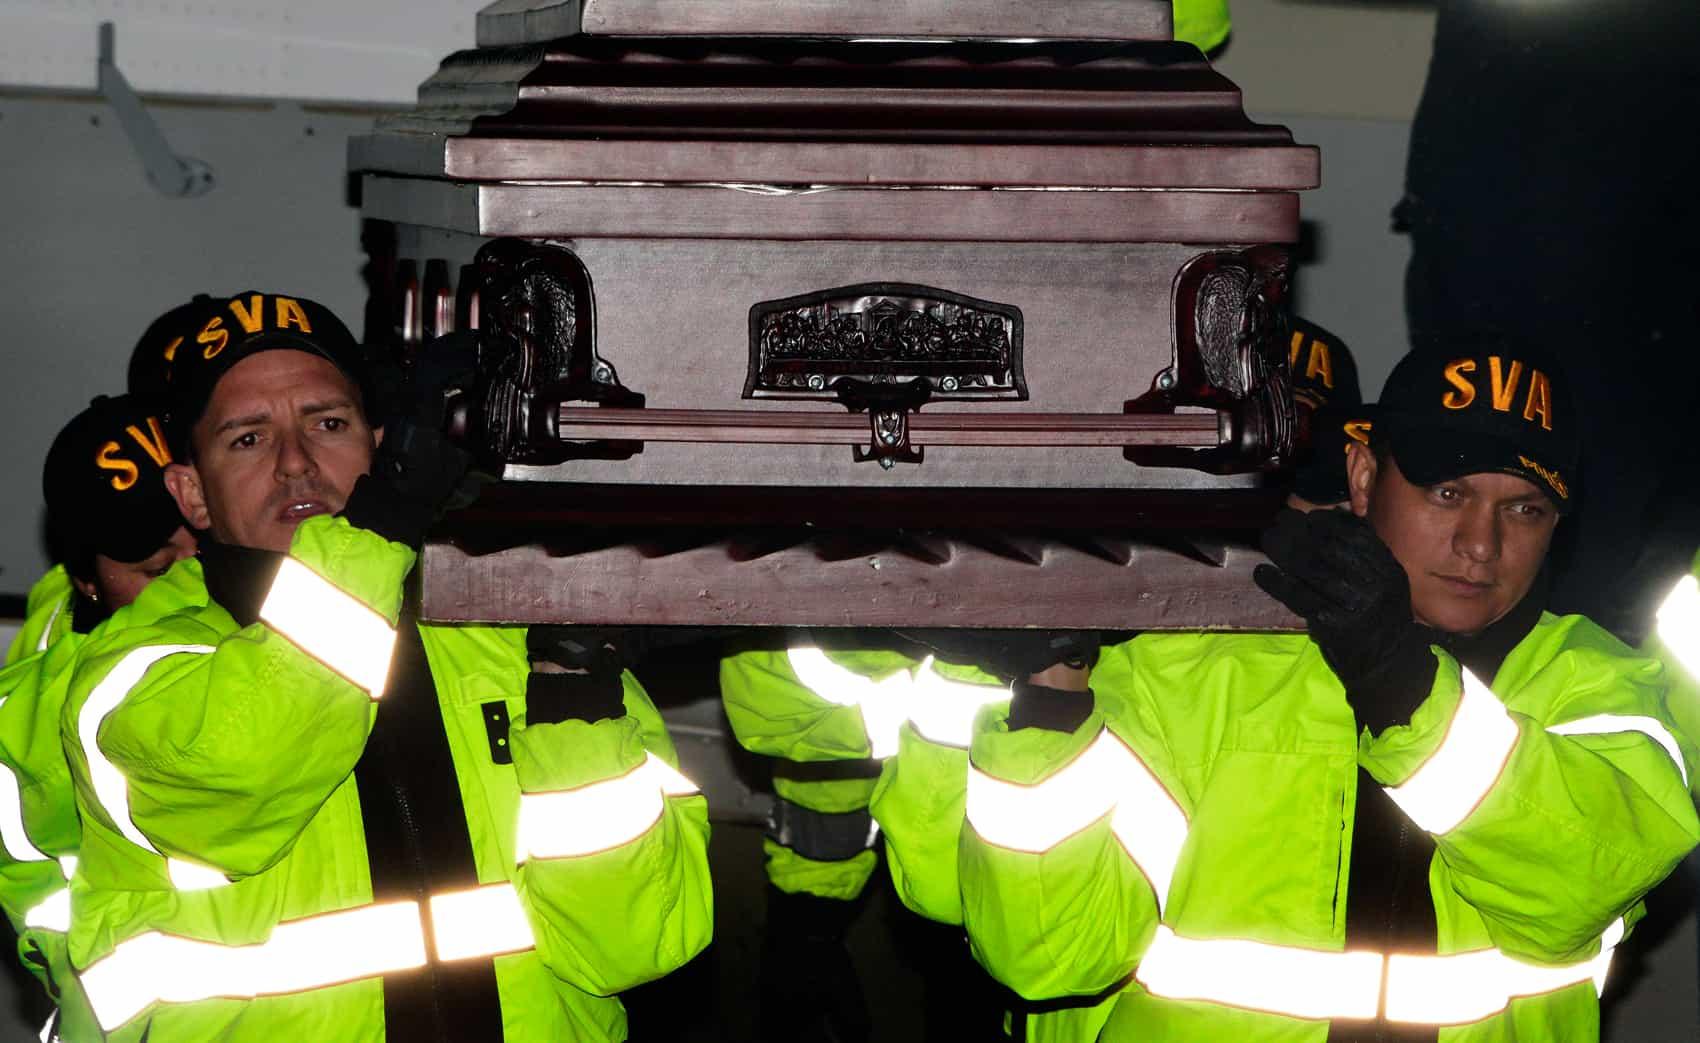 Costa Rican Air Surveillance Service officers escort a body